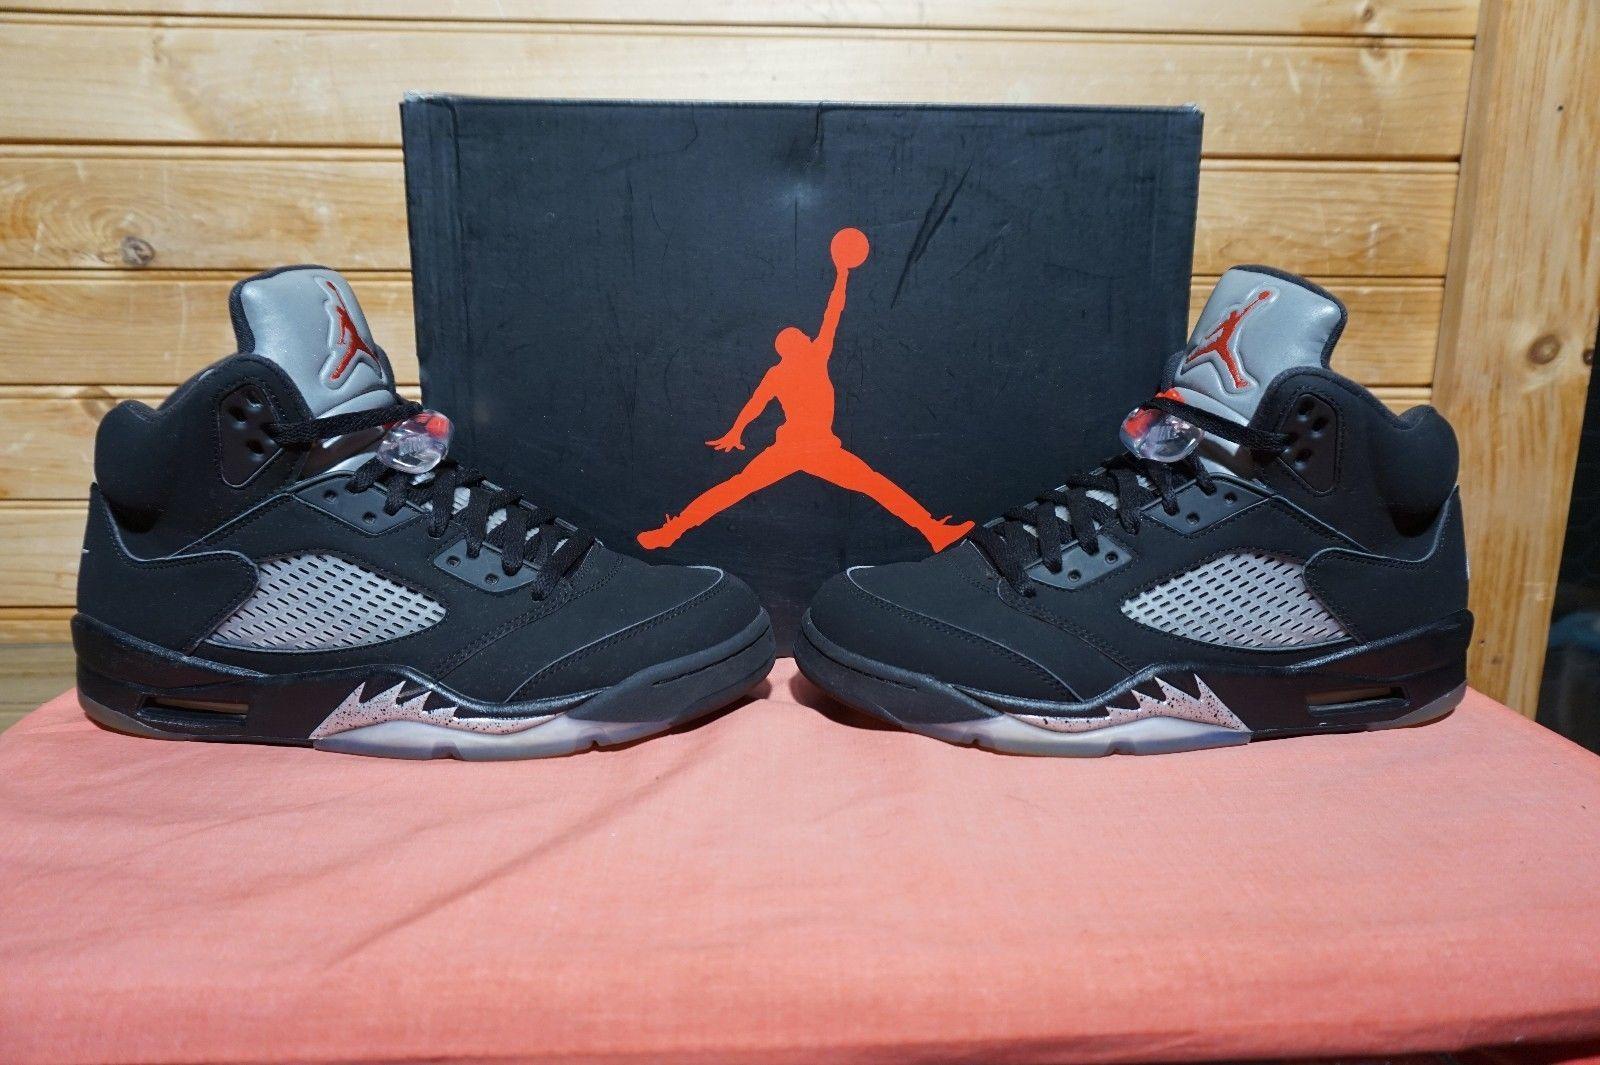 b29a4a2c5beb Nike Air Jordan 5 Retro OG Black Metallic Silver Fire Red White Size 9  (1806)